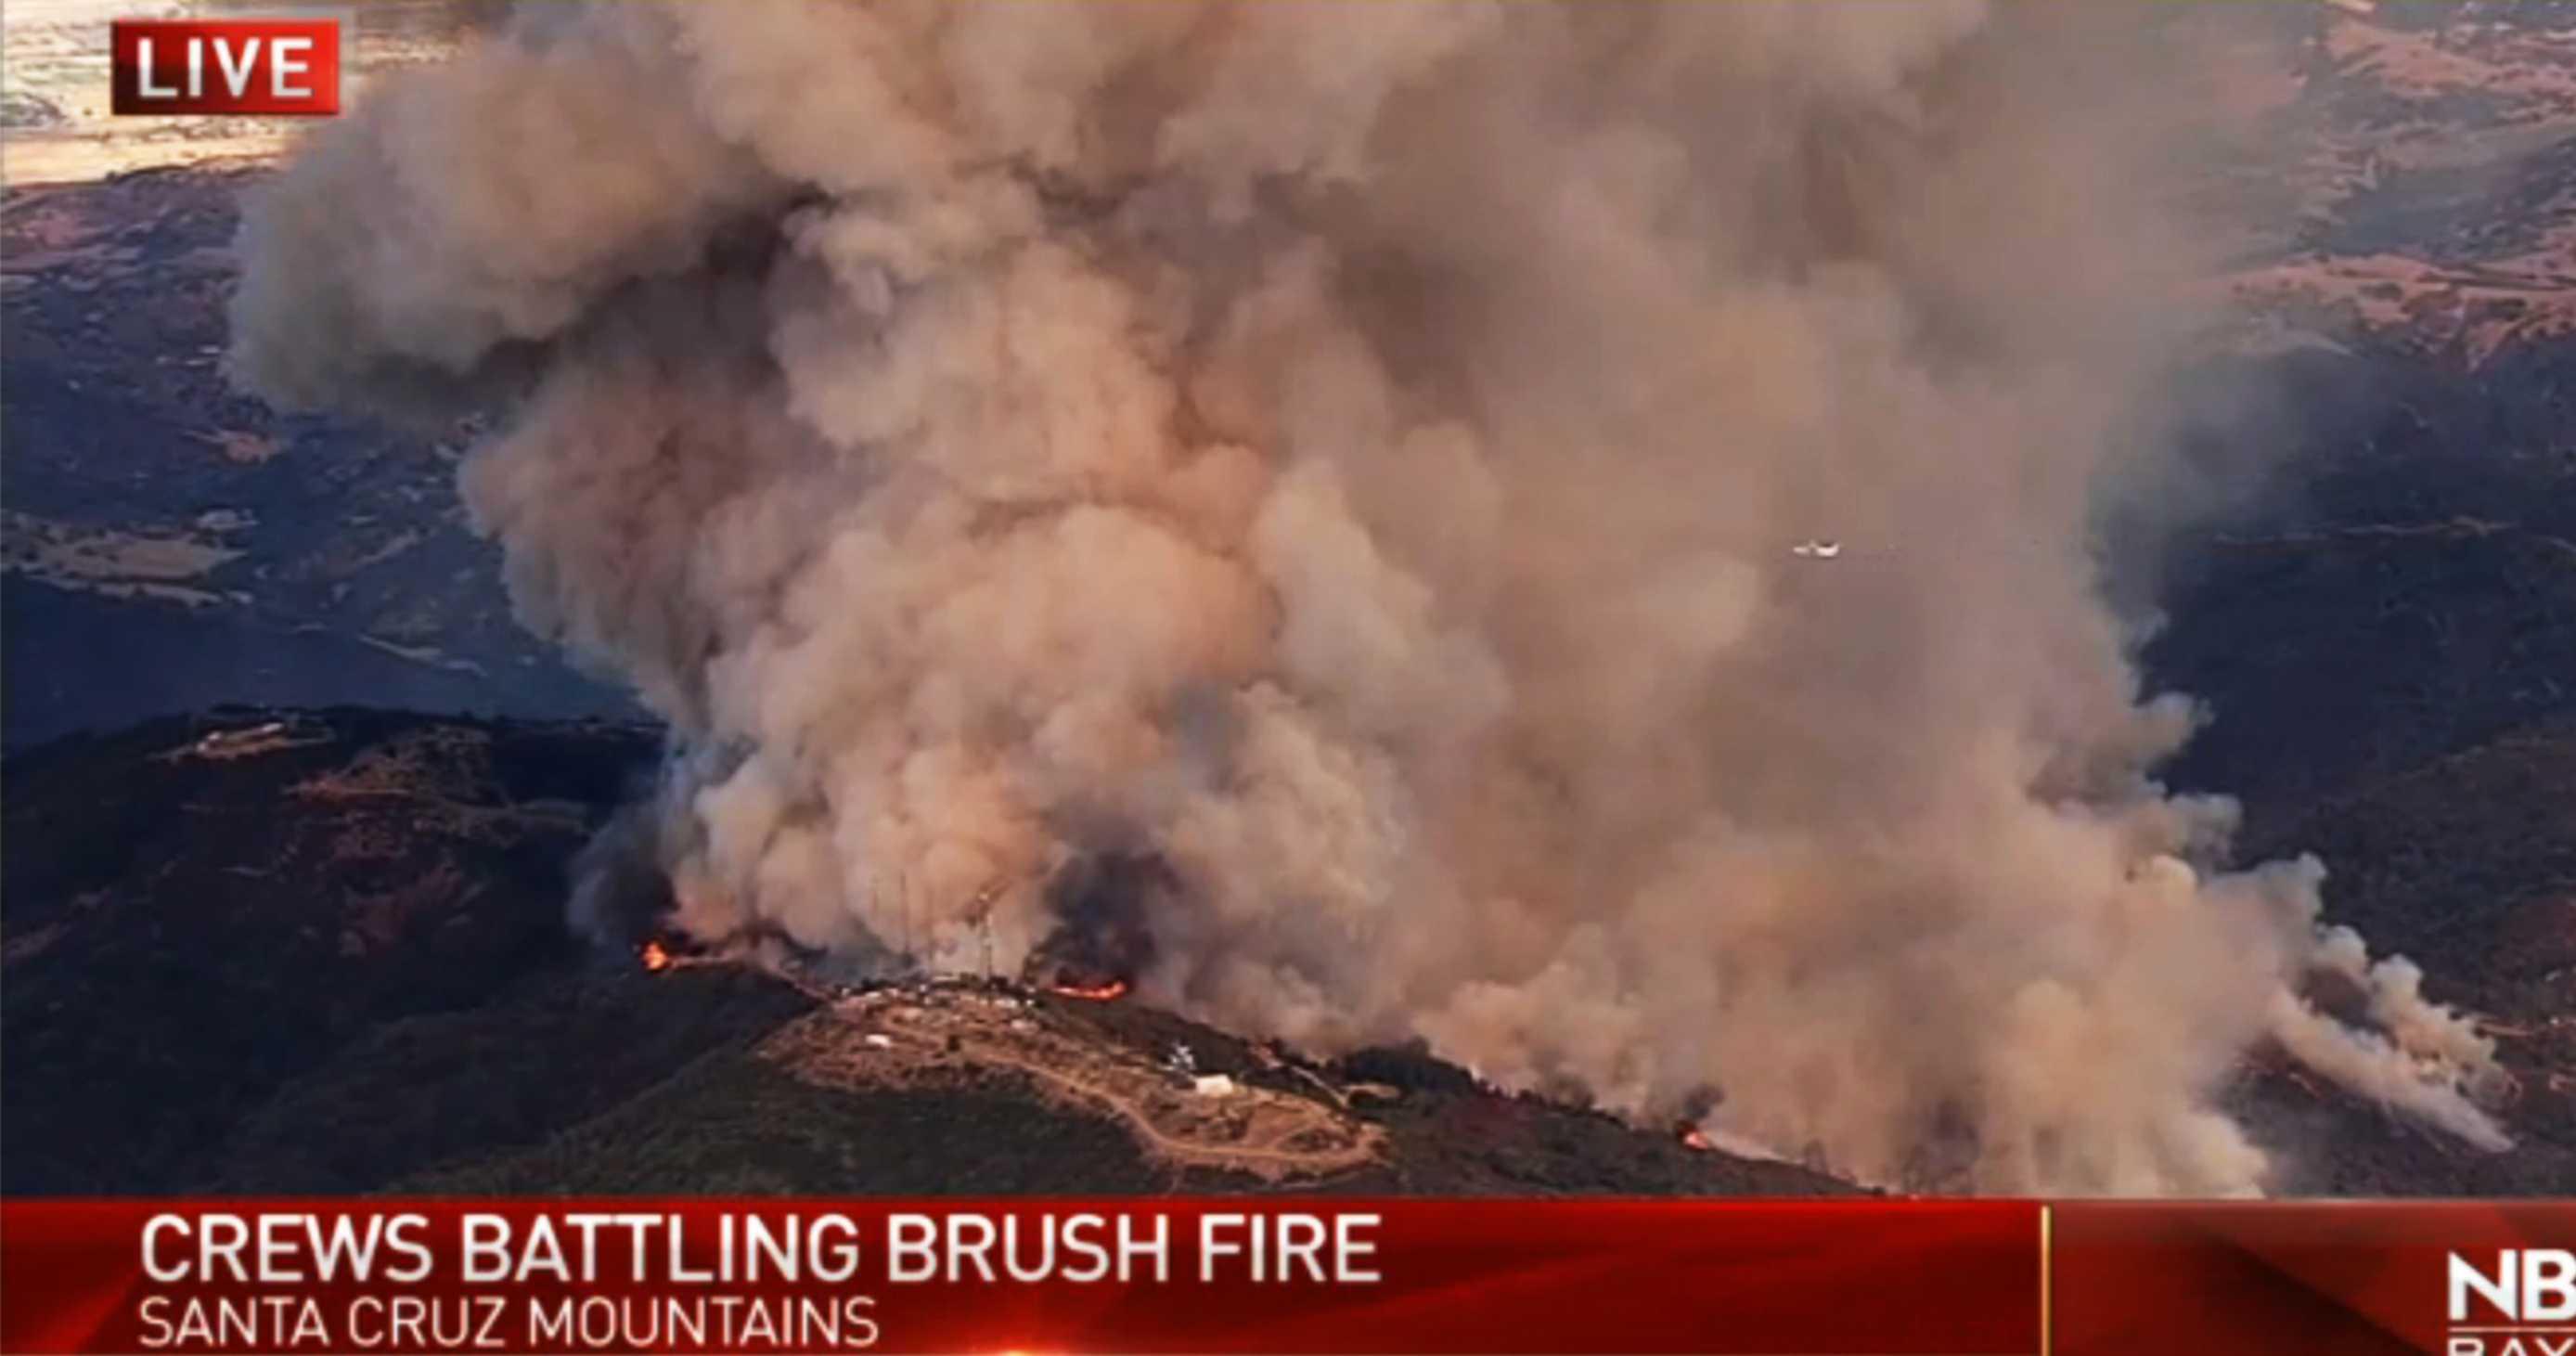 Wildfire in Santa Cruz mountains forces evacuations